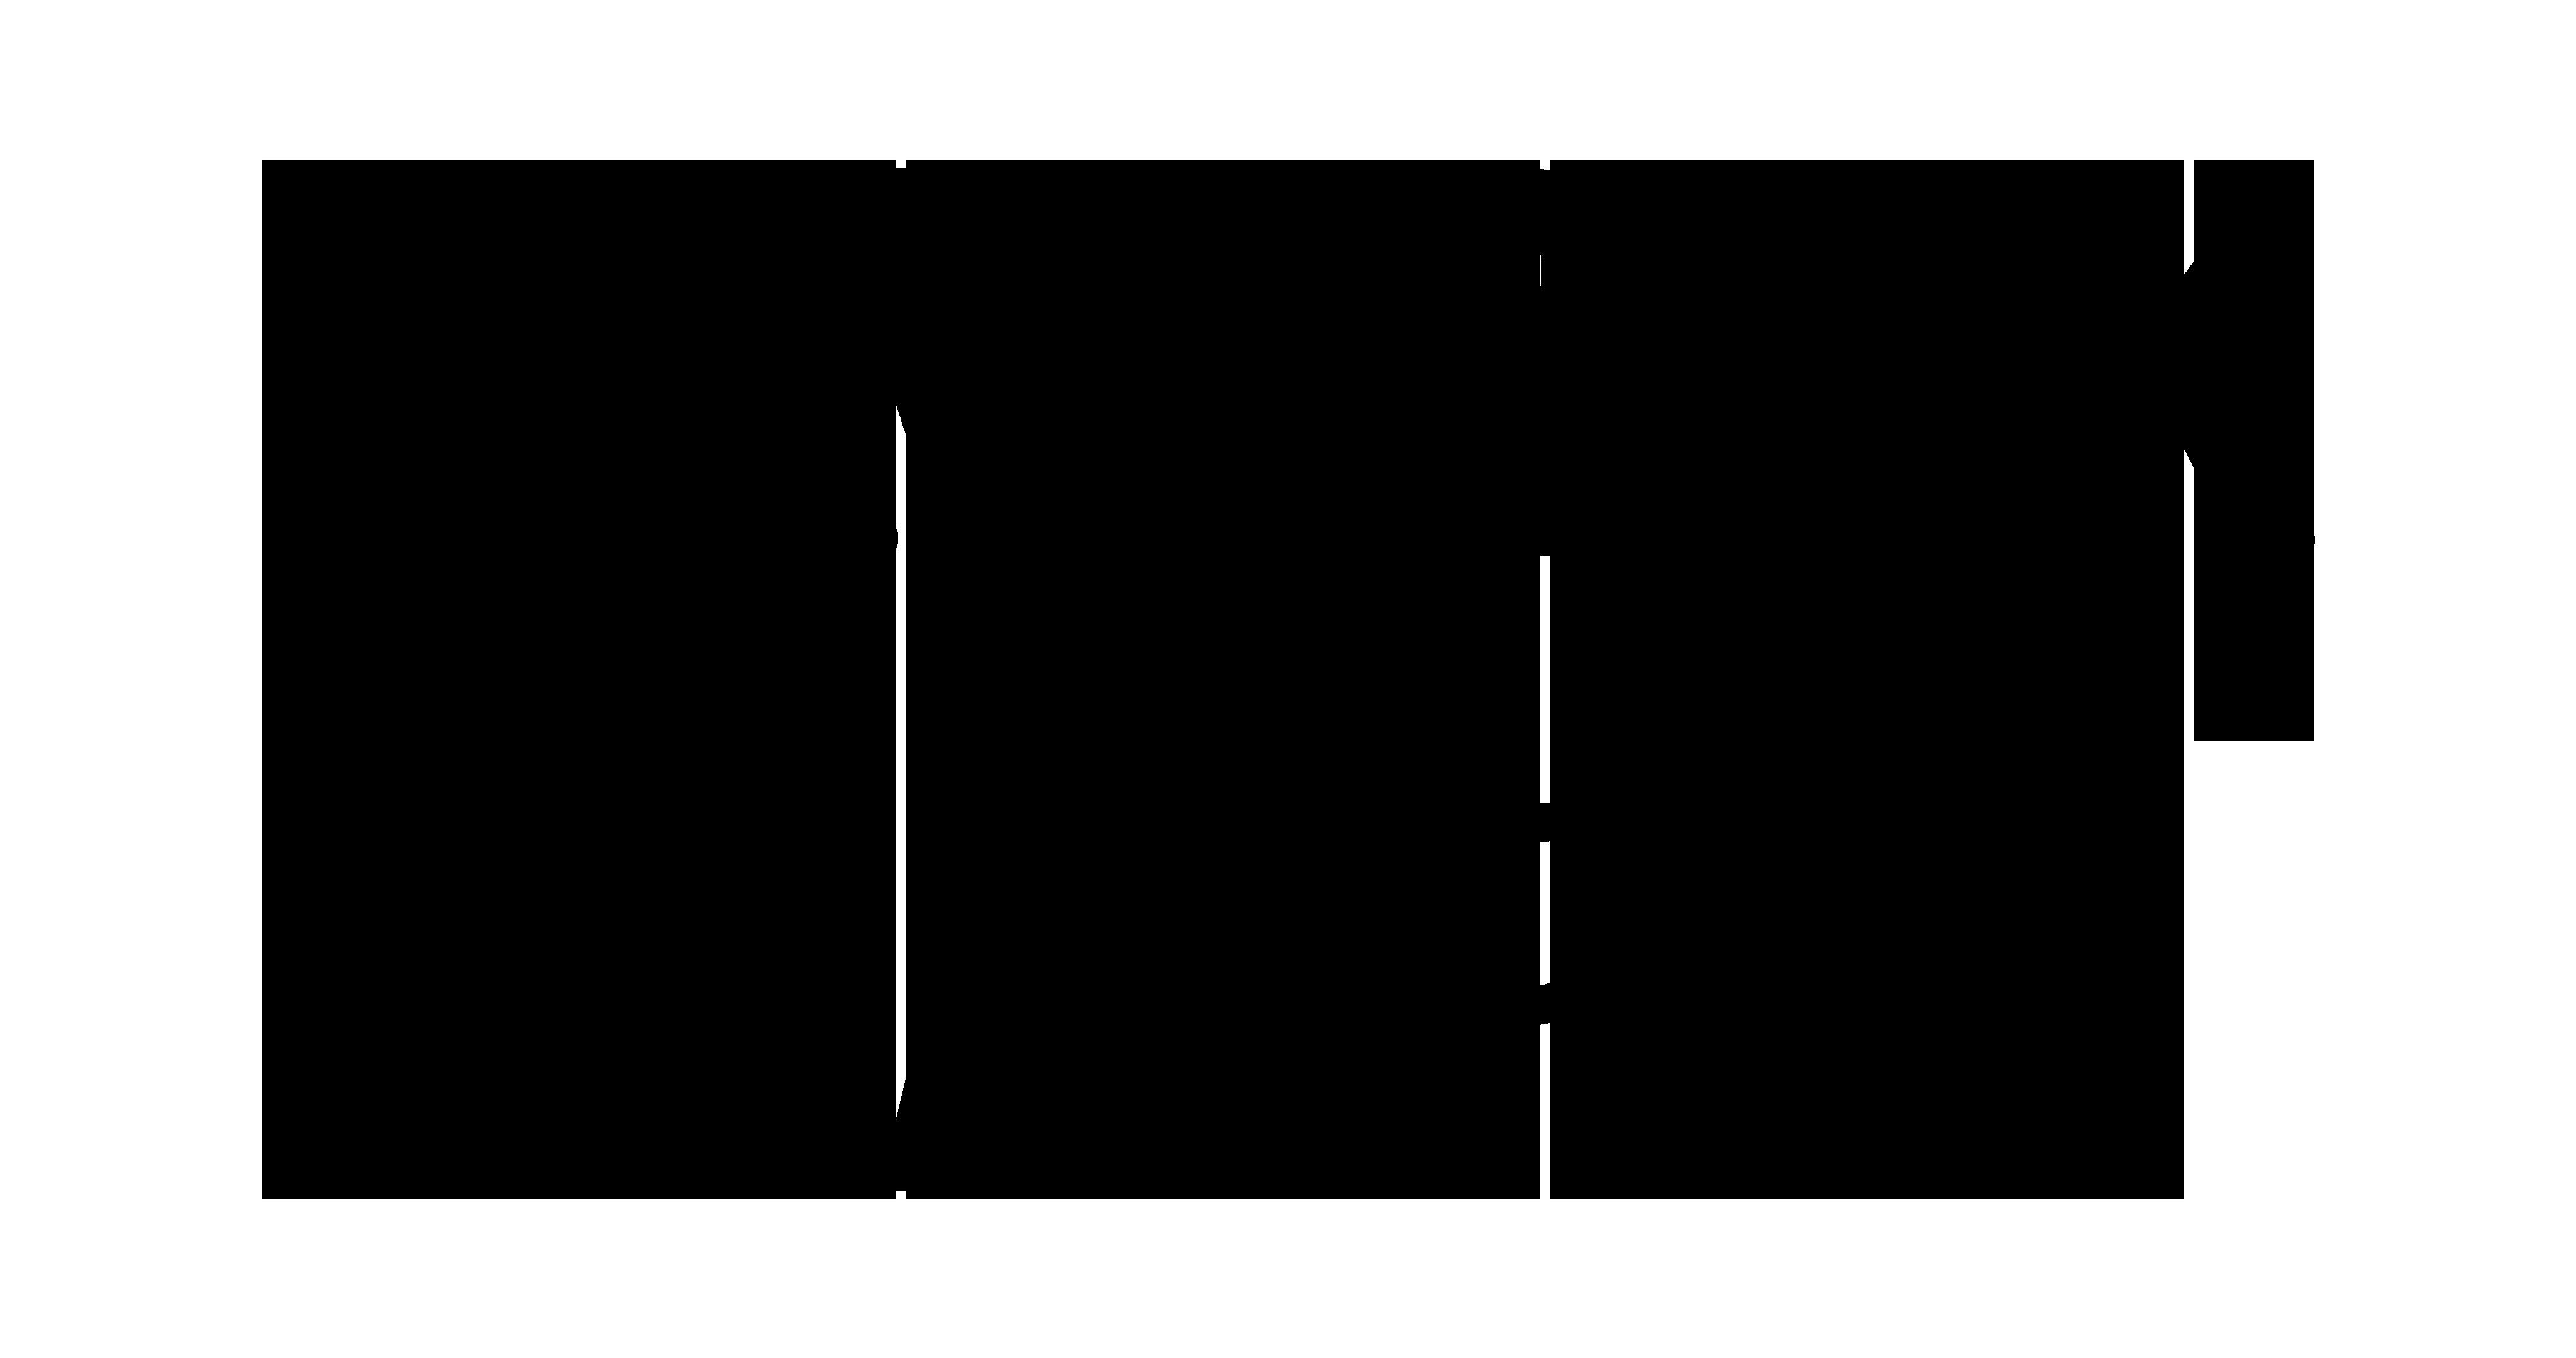 Maverick Sabre